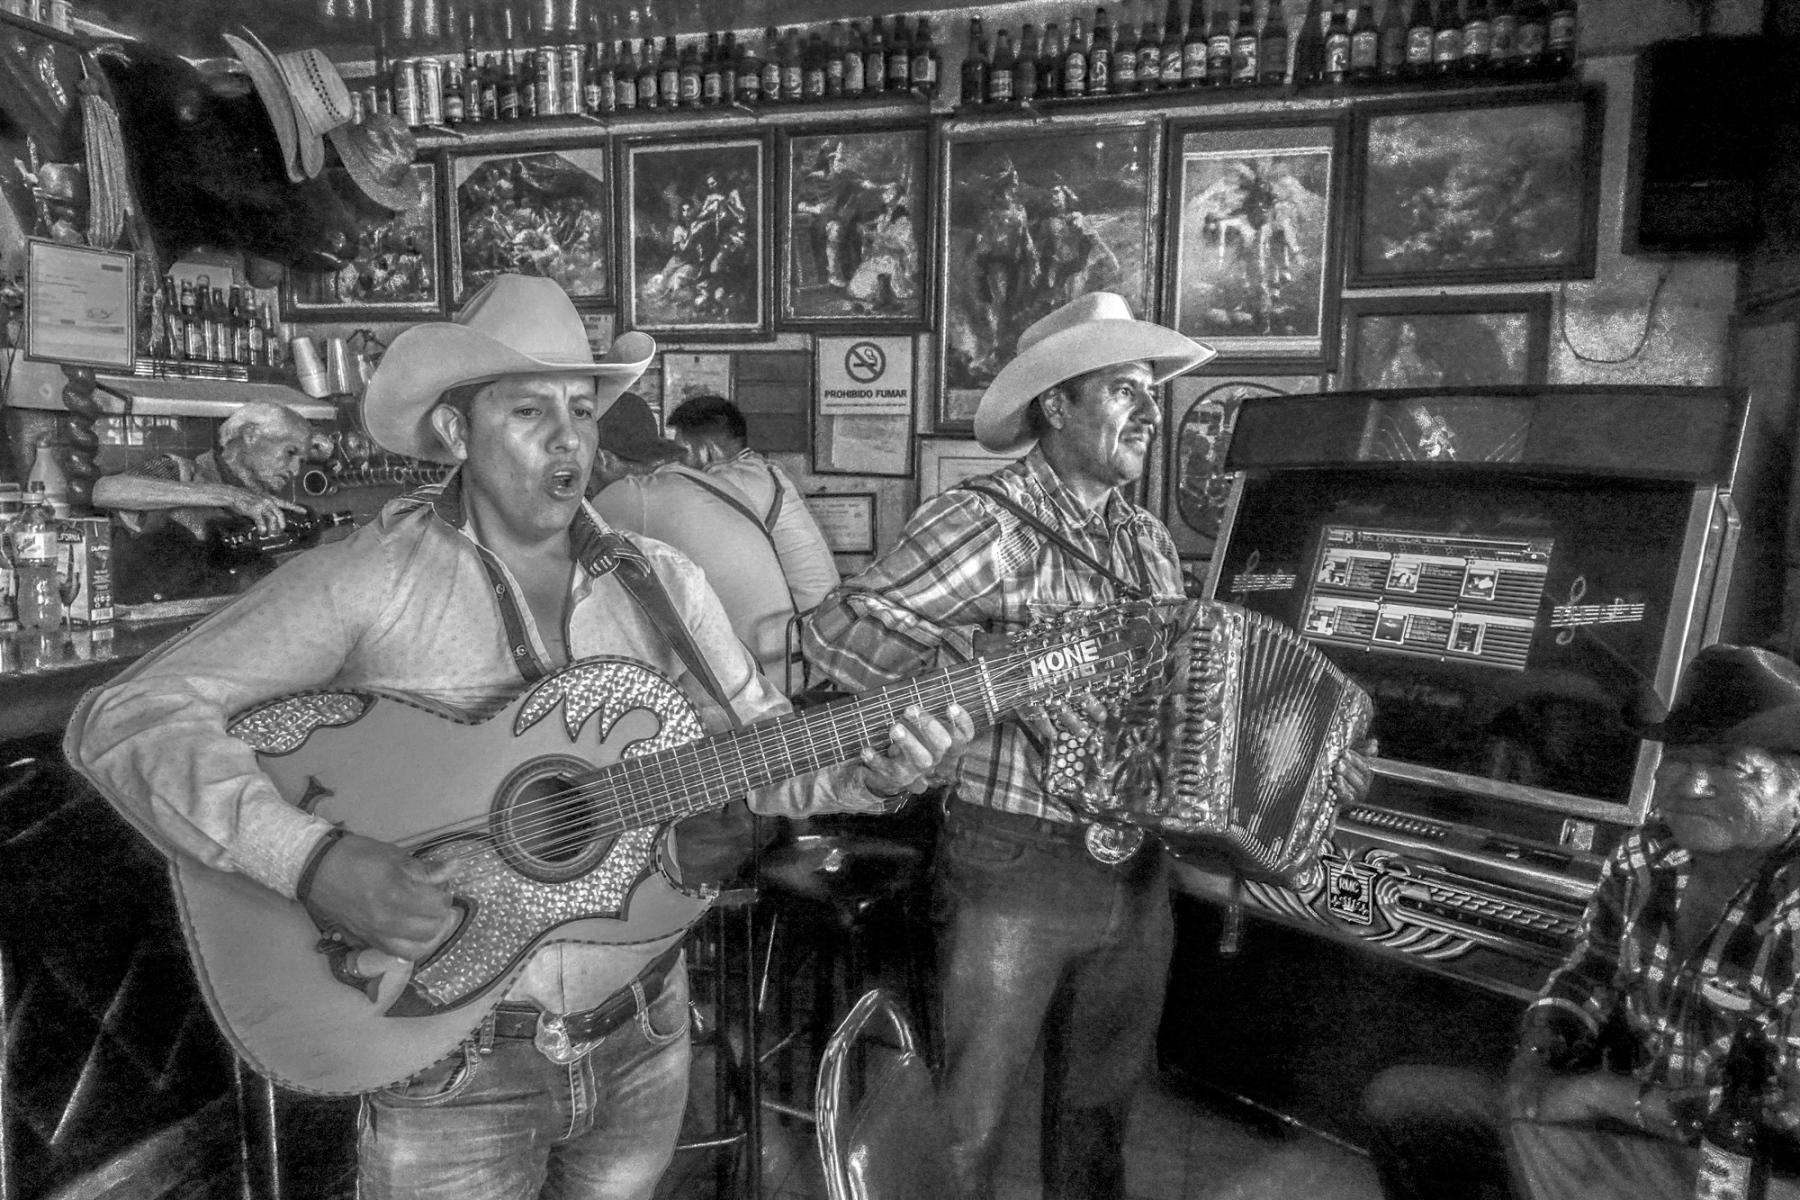 Saloon Singers